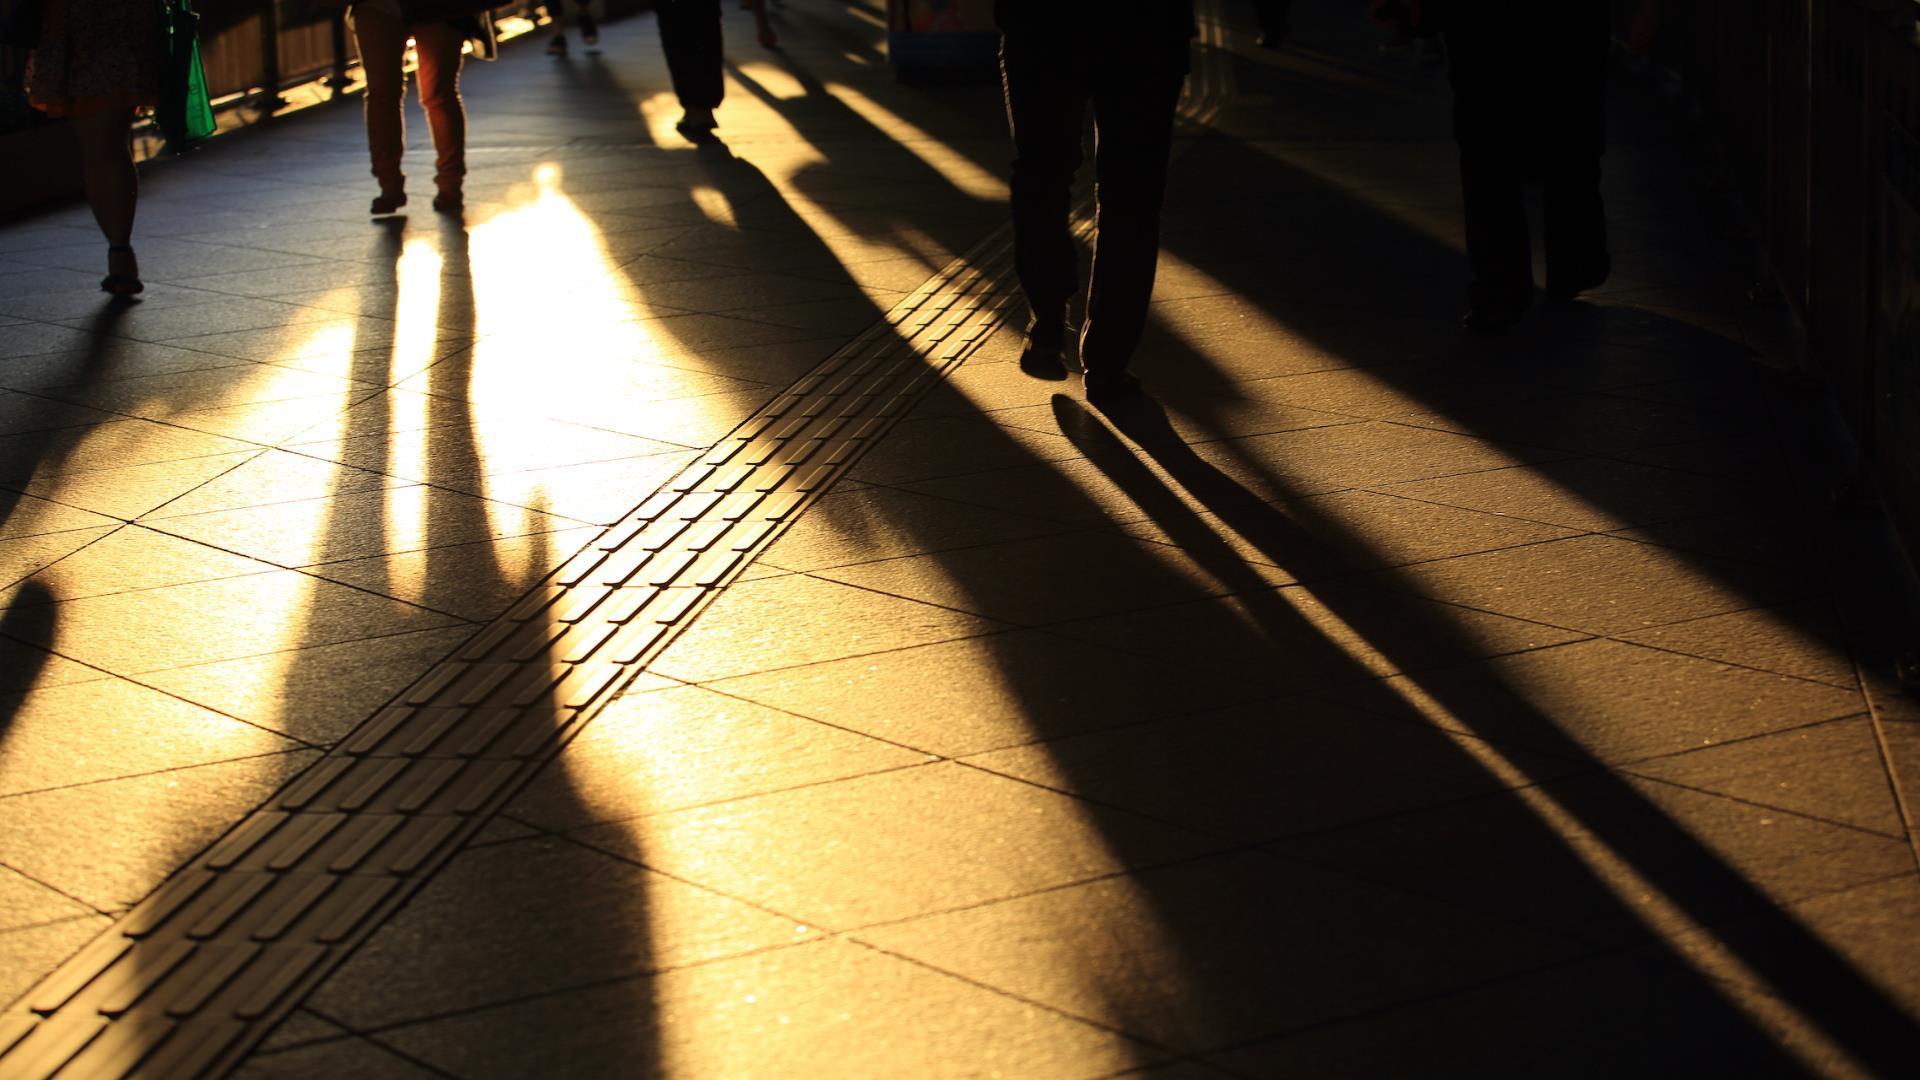 People walking in shadow